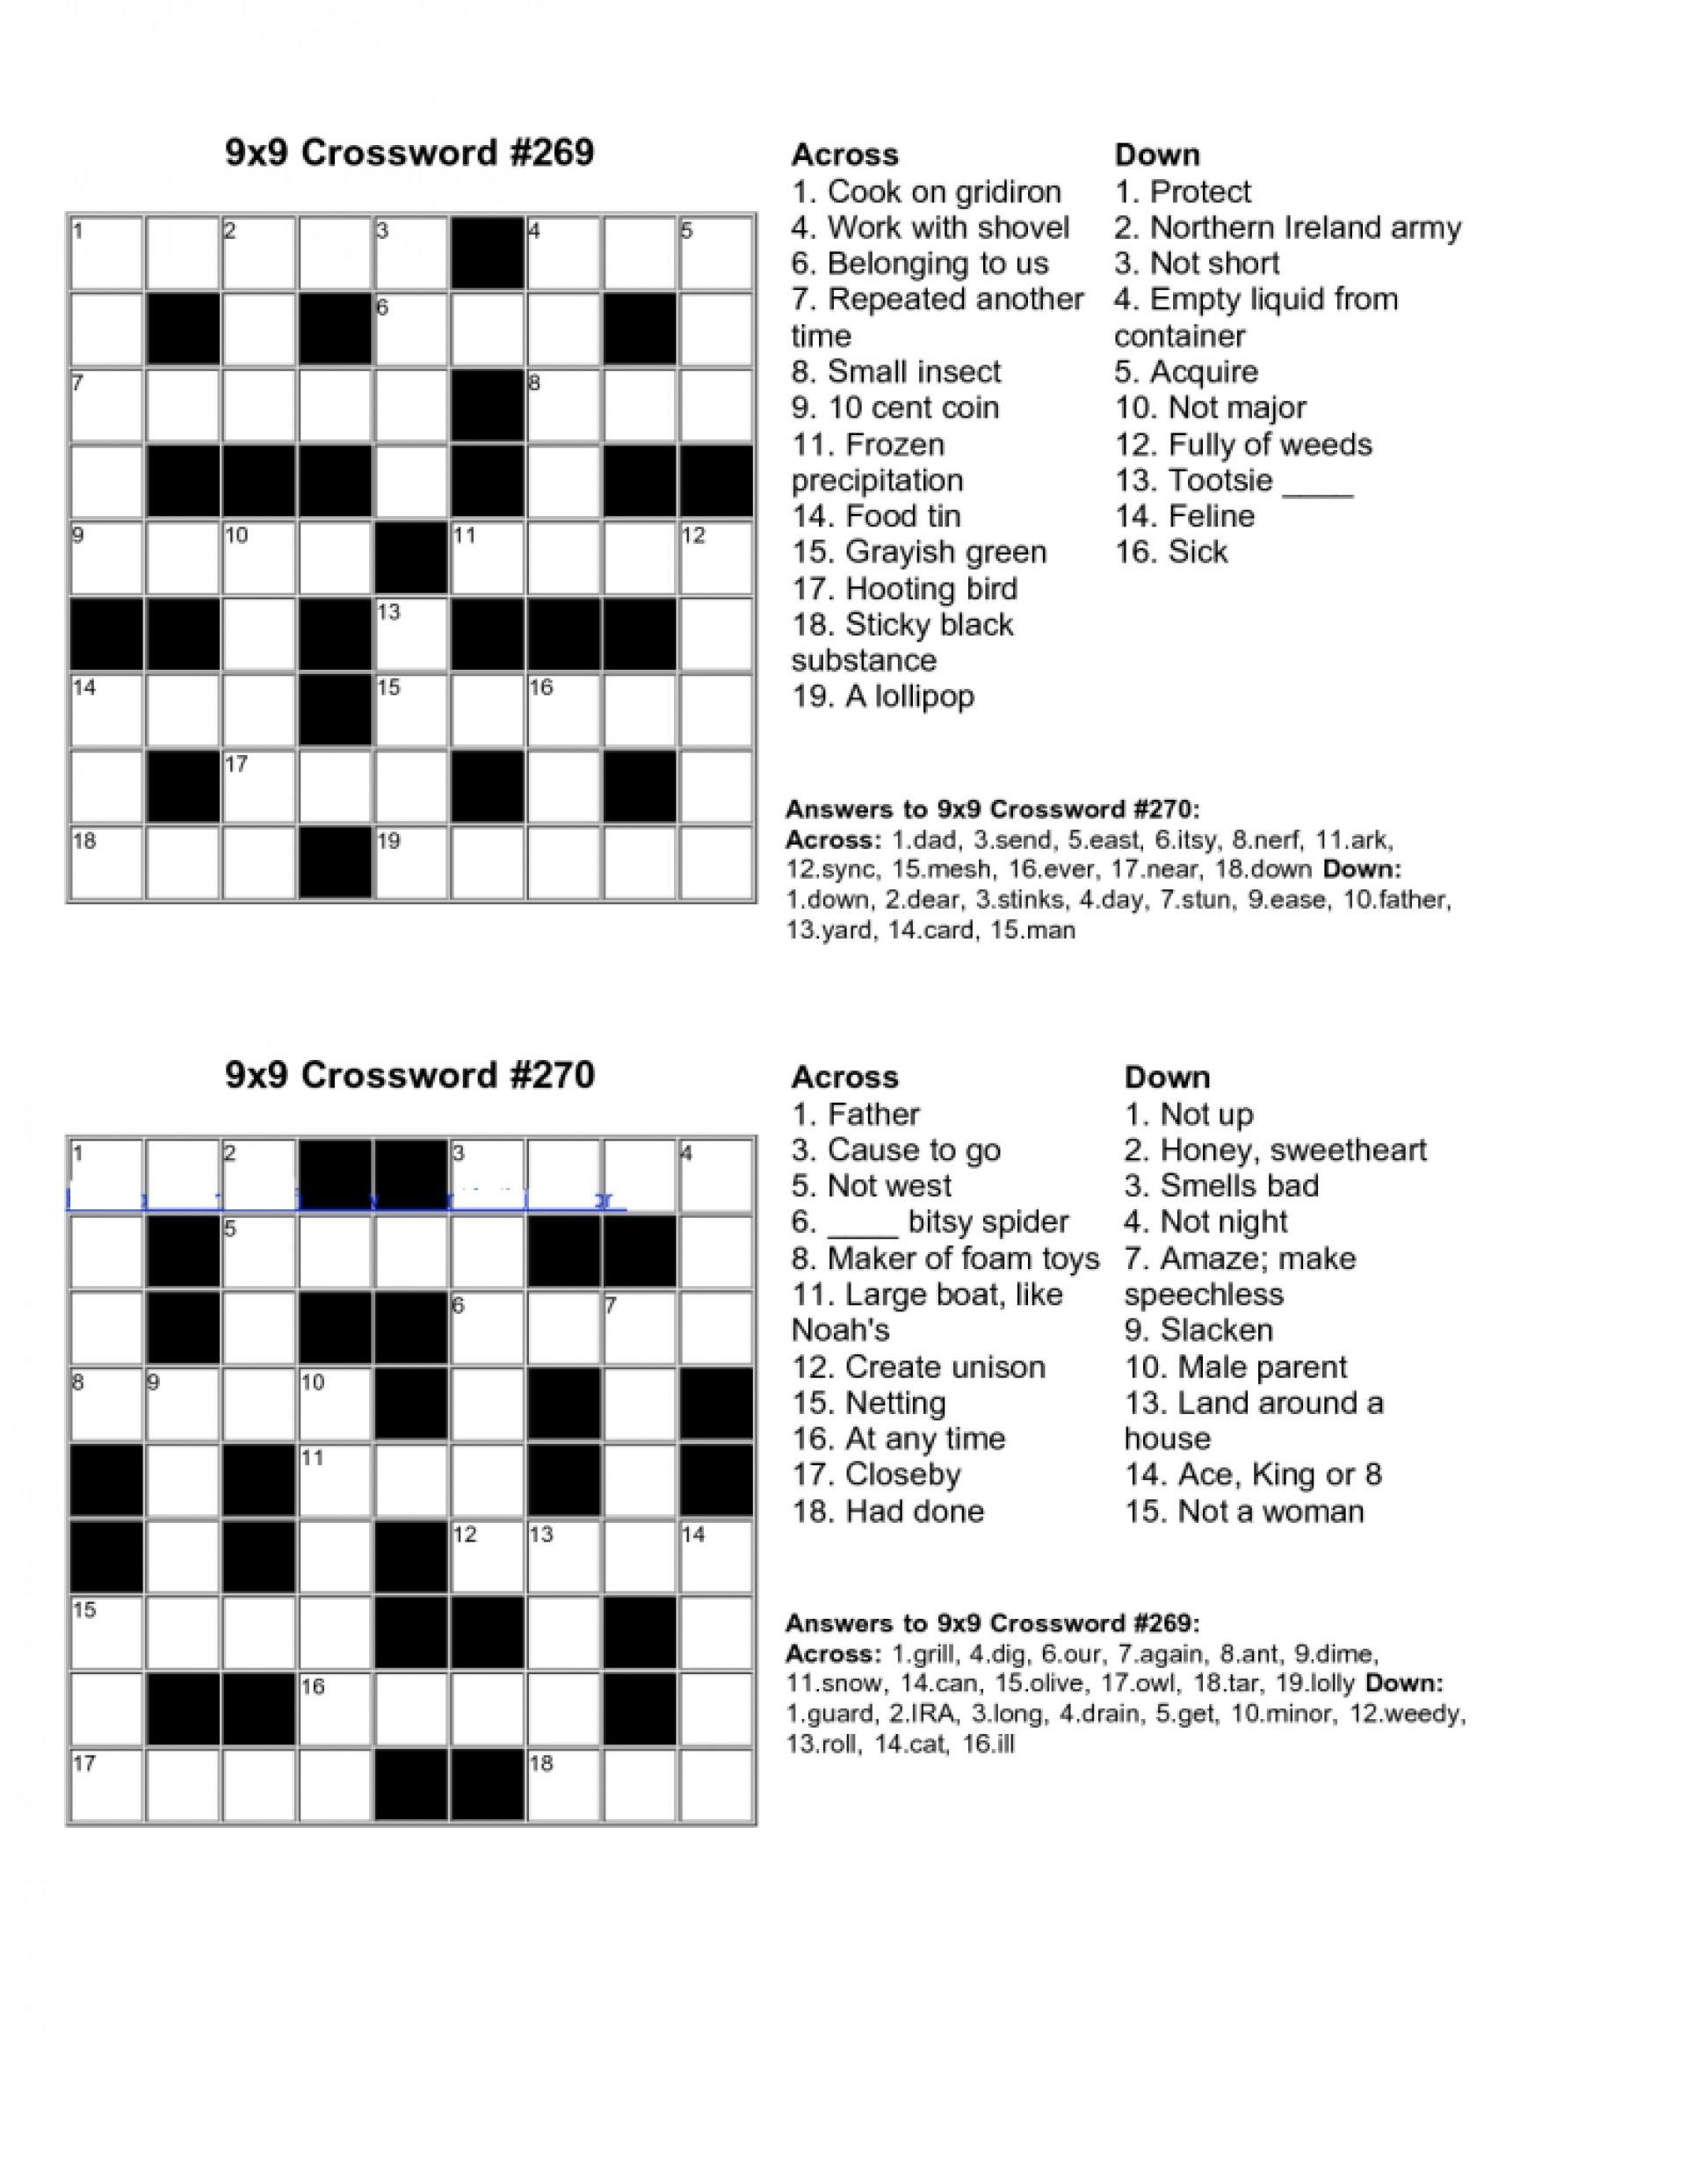 February Crossword Puzzle Answer Key Printables For Kids Free Easy - February Crossword Puzzle Printable